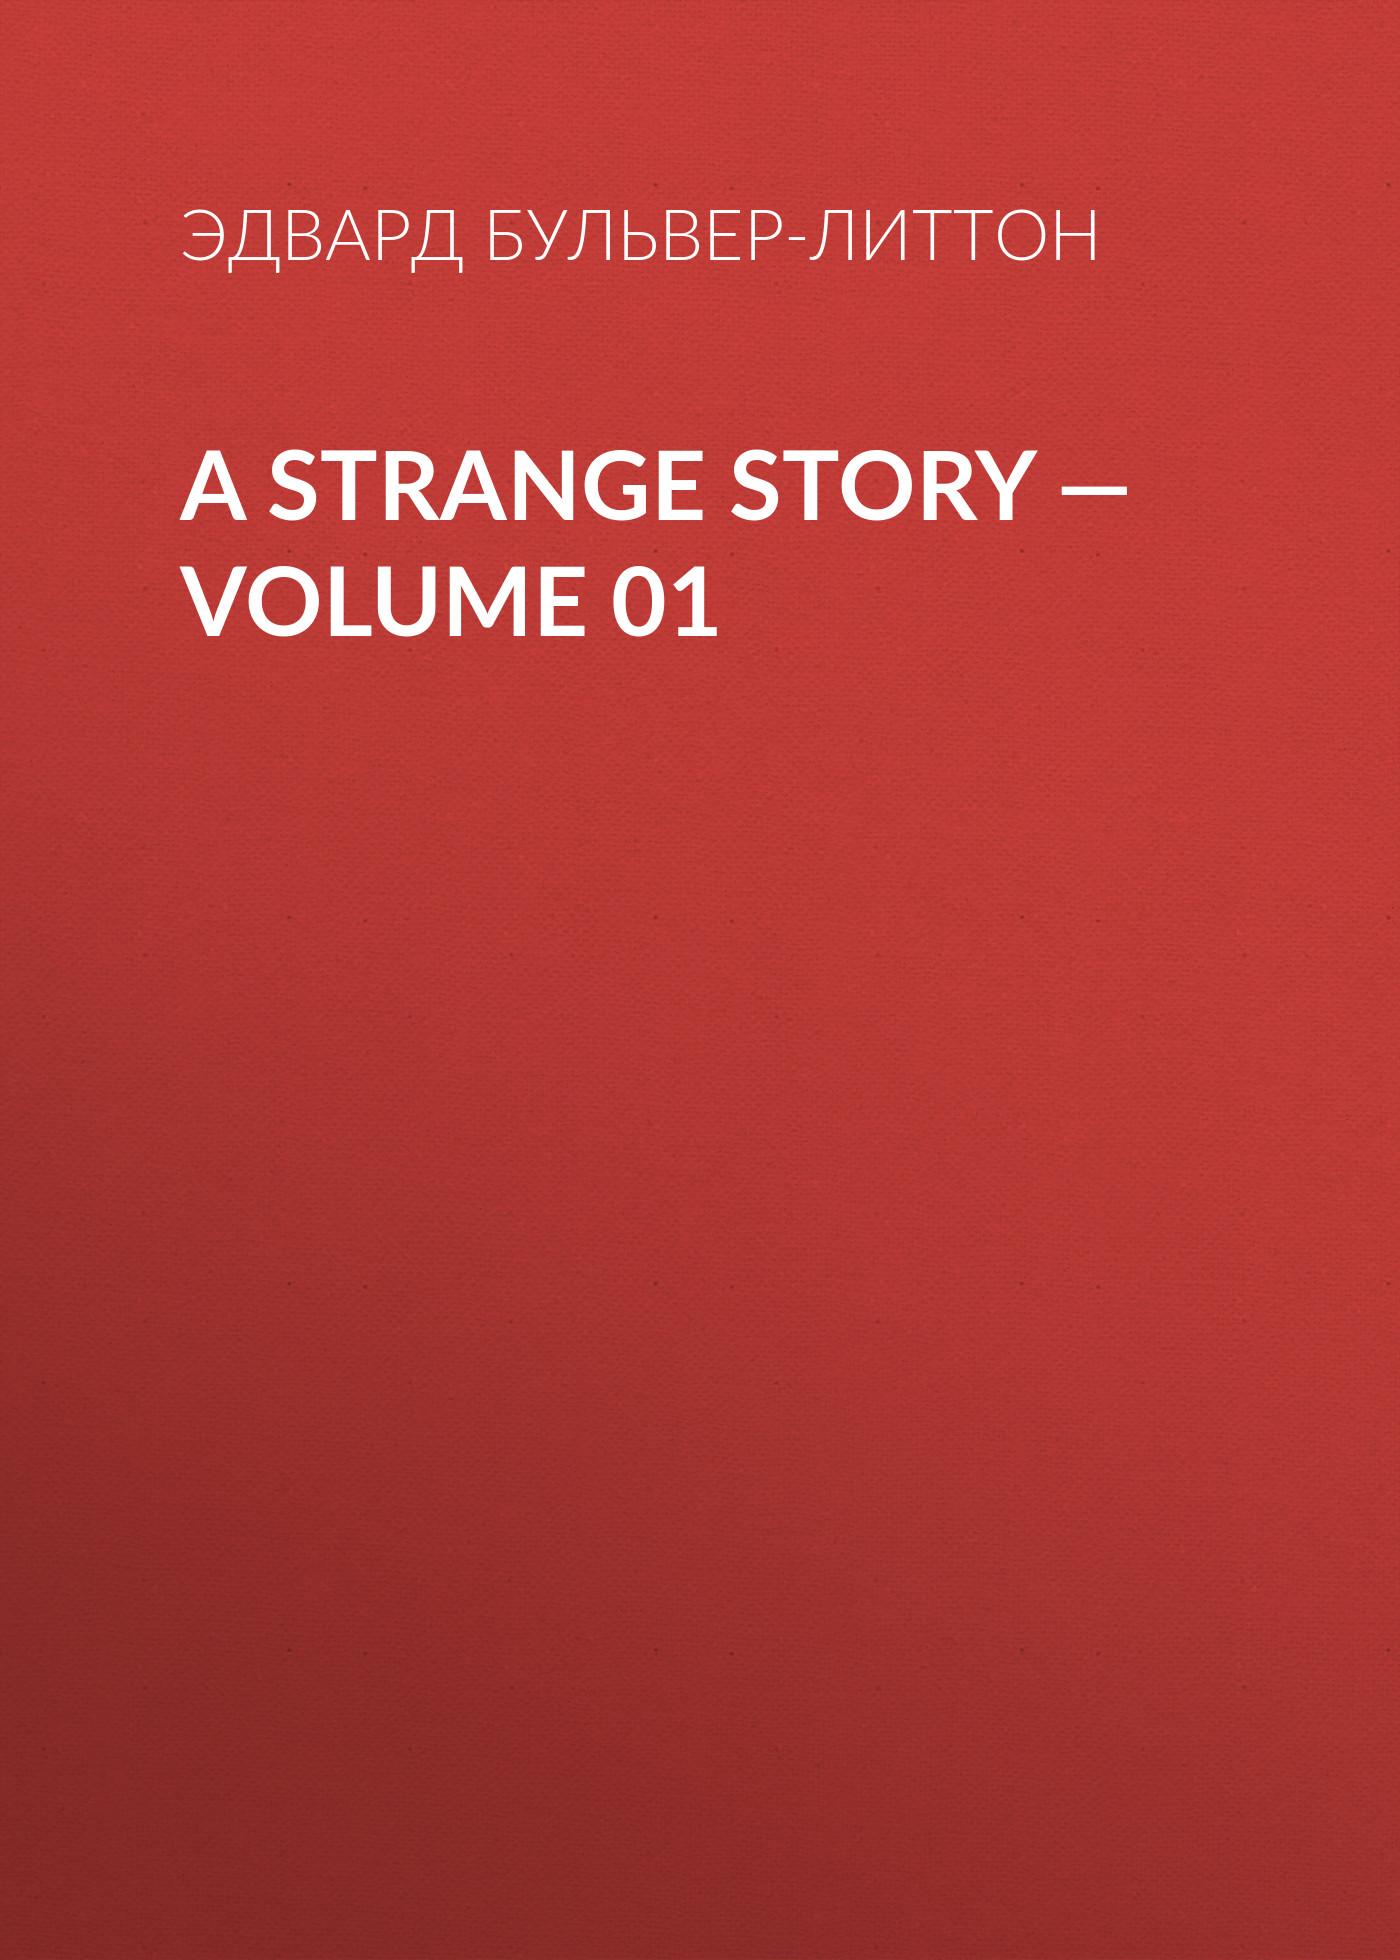 Эдвард Бульвер-Литтон A Strange Story — Volume 01 эдвард бульвер литтон devereux volume 01